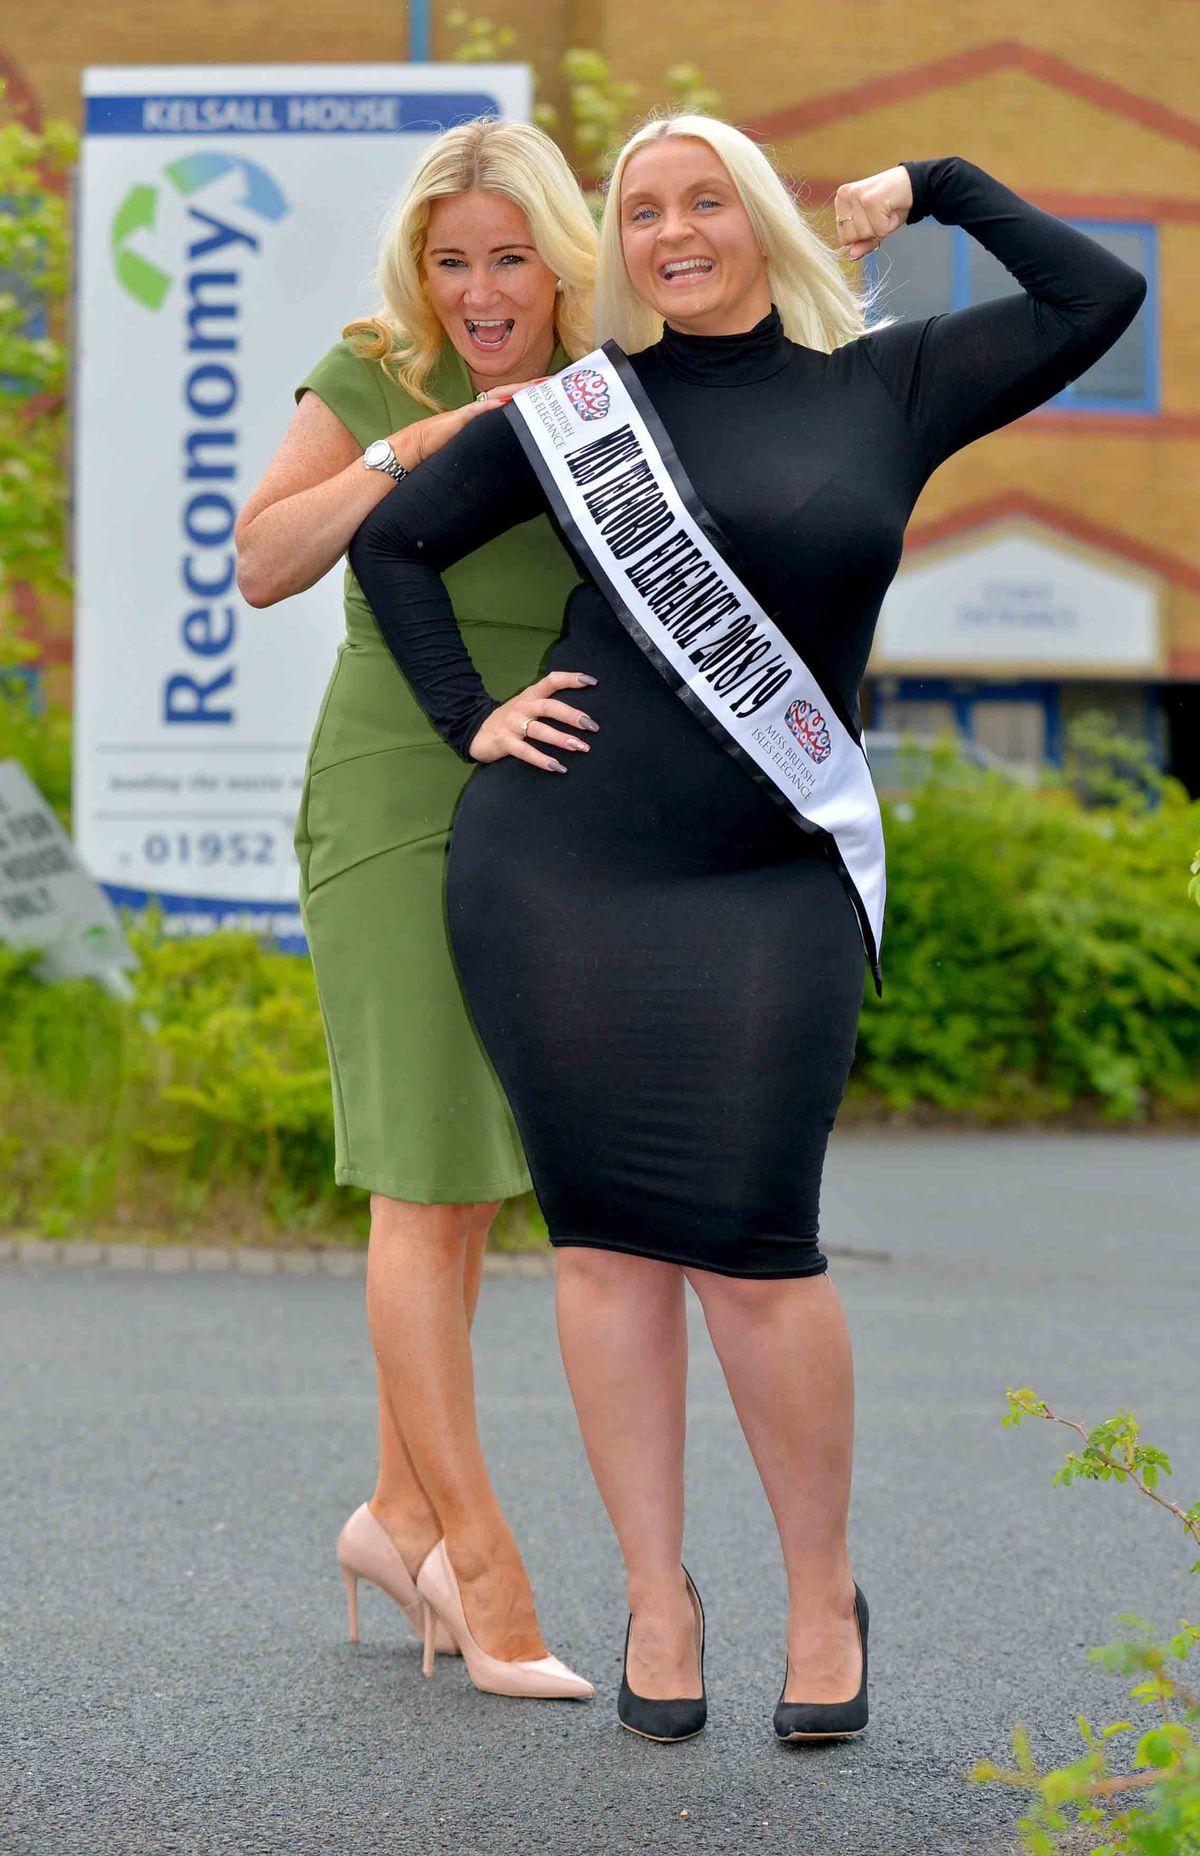 Miss Telford Elegance Georgina Powell heads for the Miss British Isles final with Faith Mackey